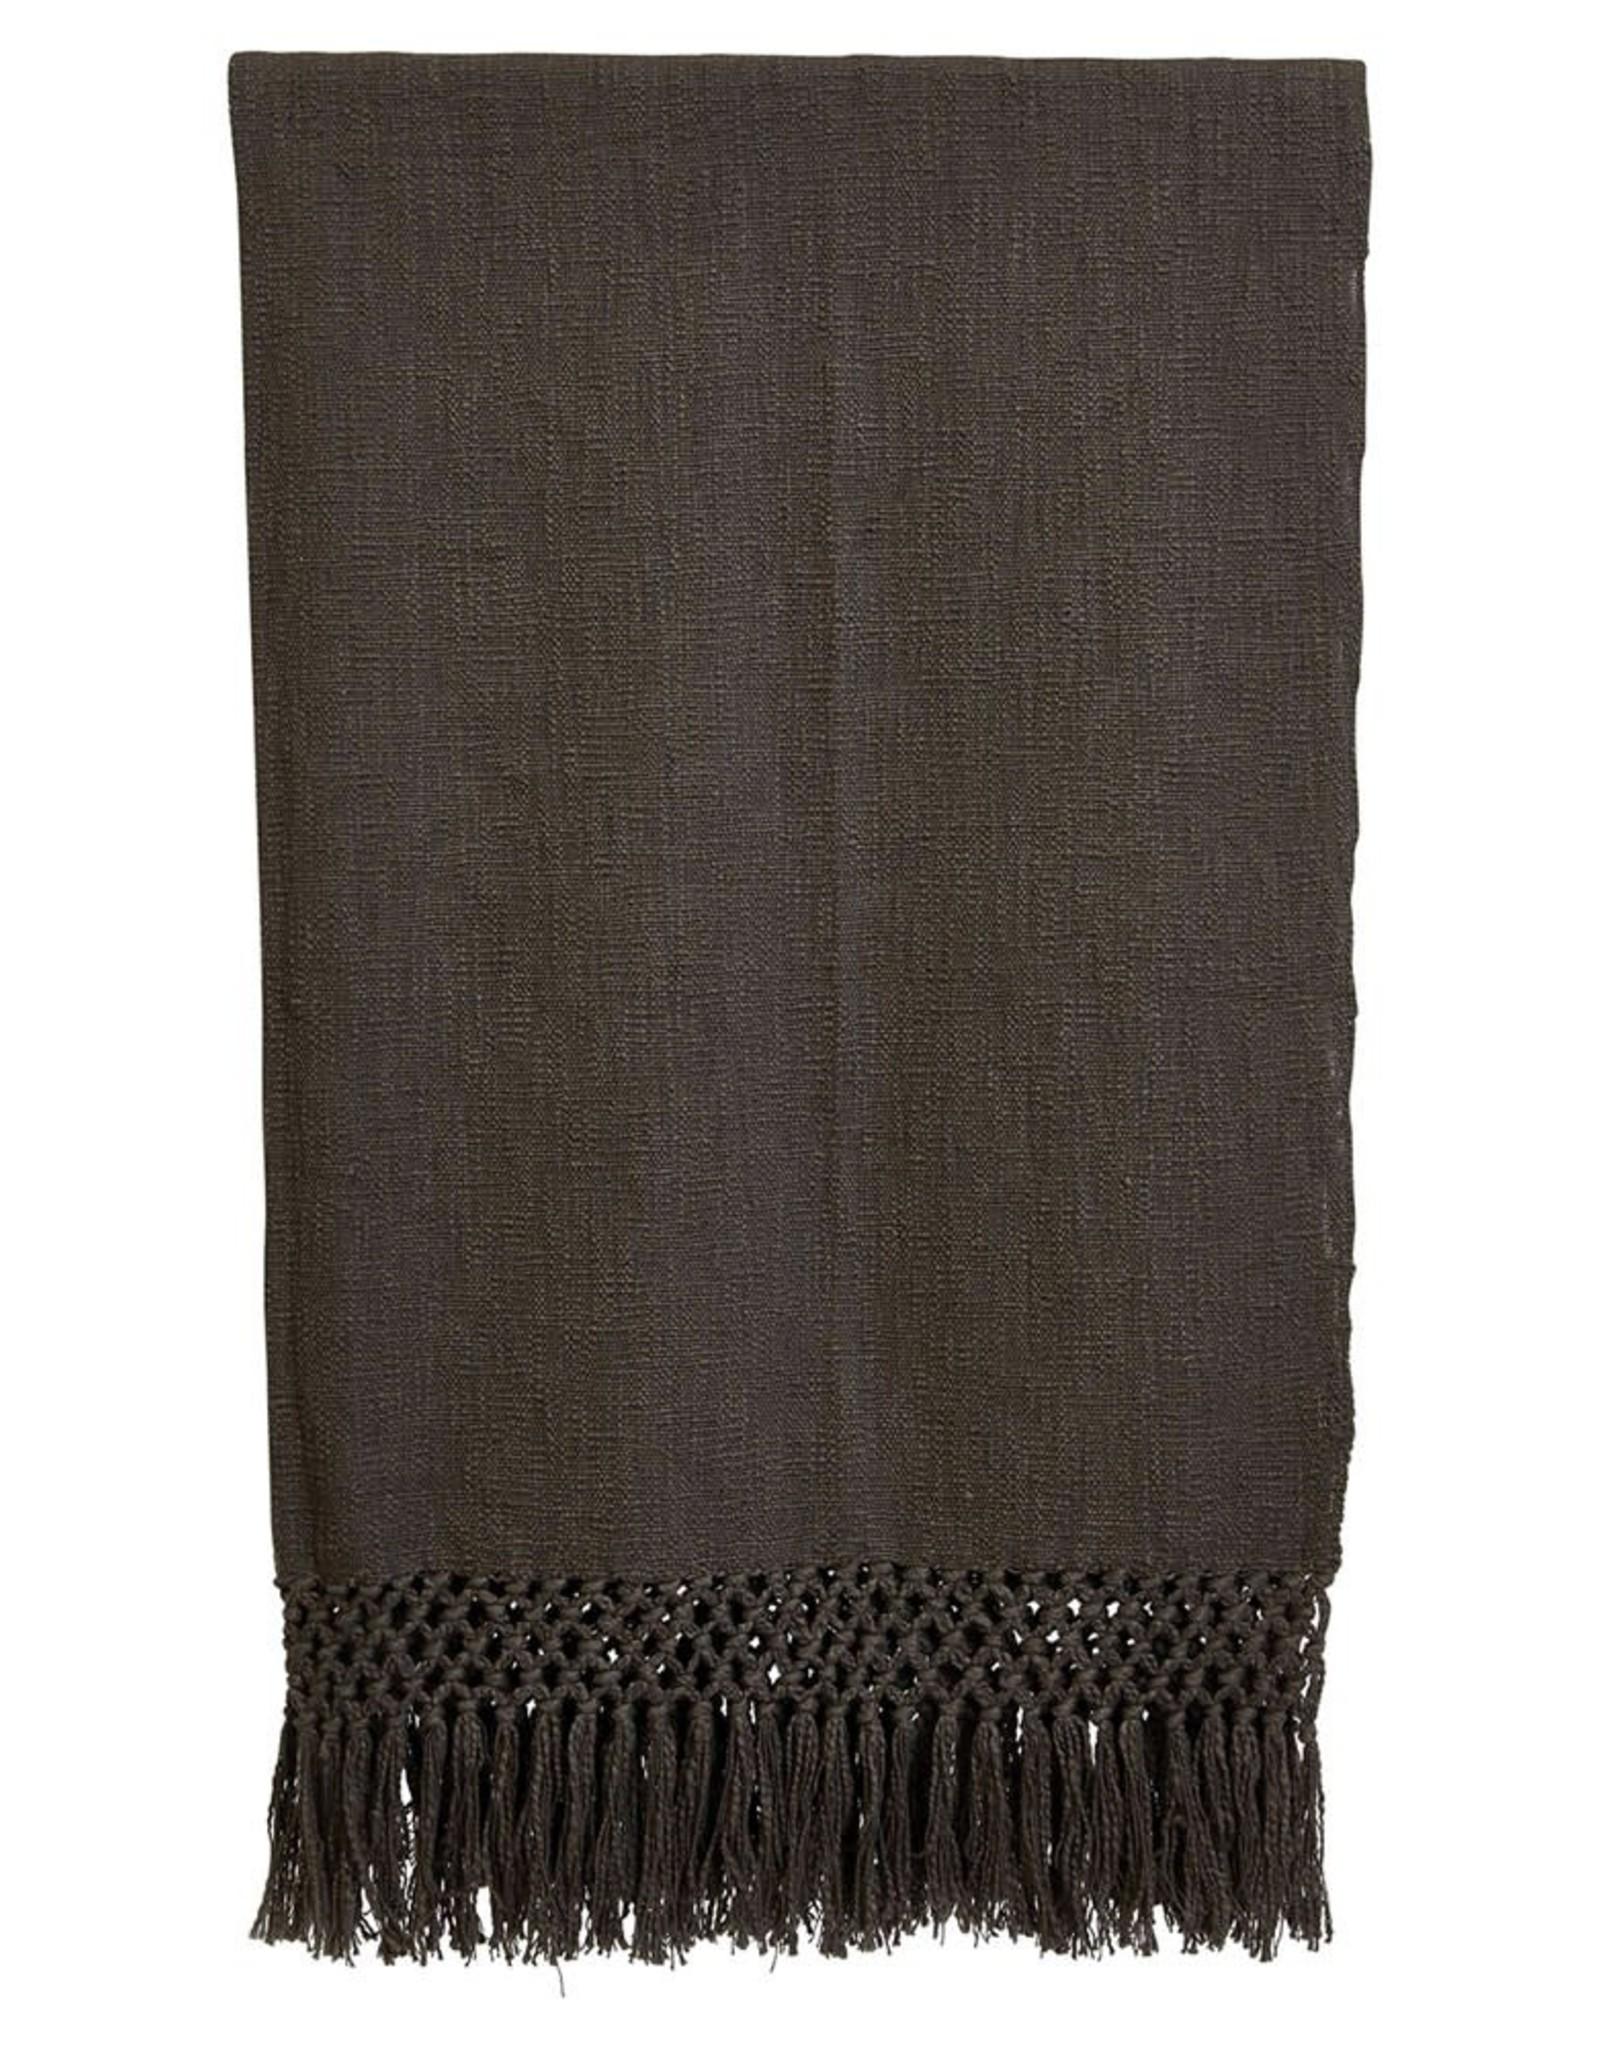 Charcoal Crochet Edged Throw Blanket